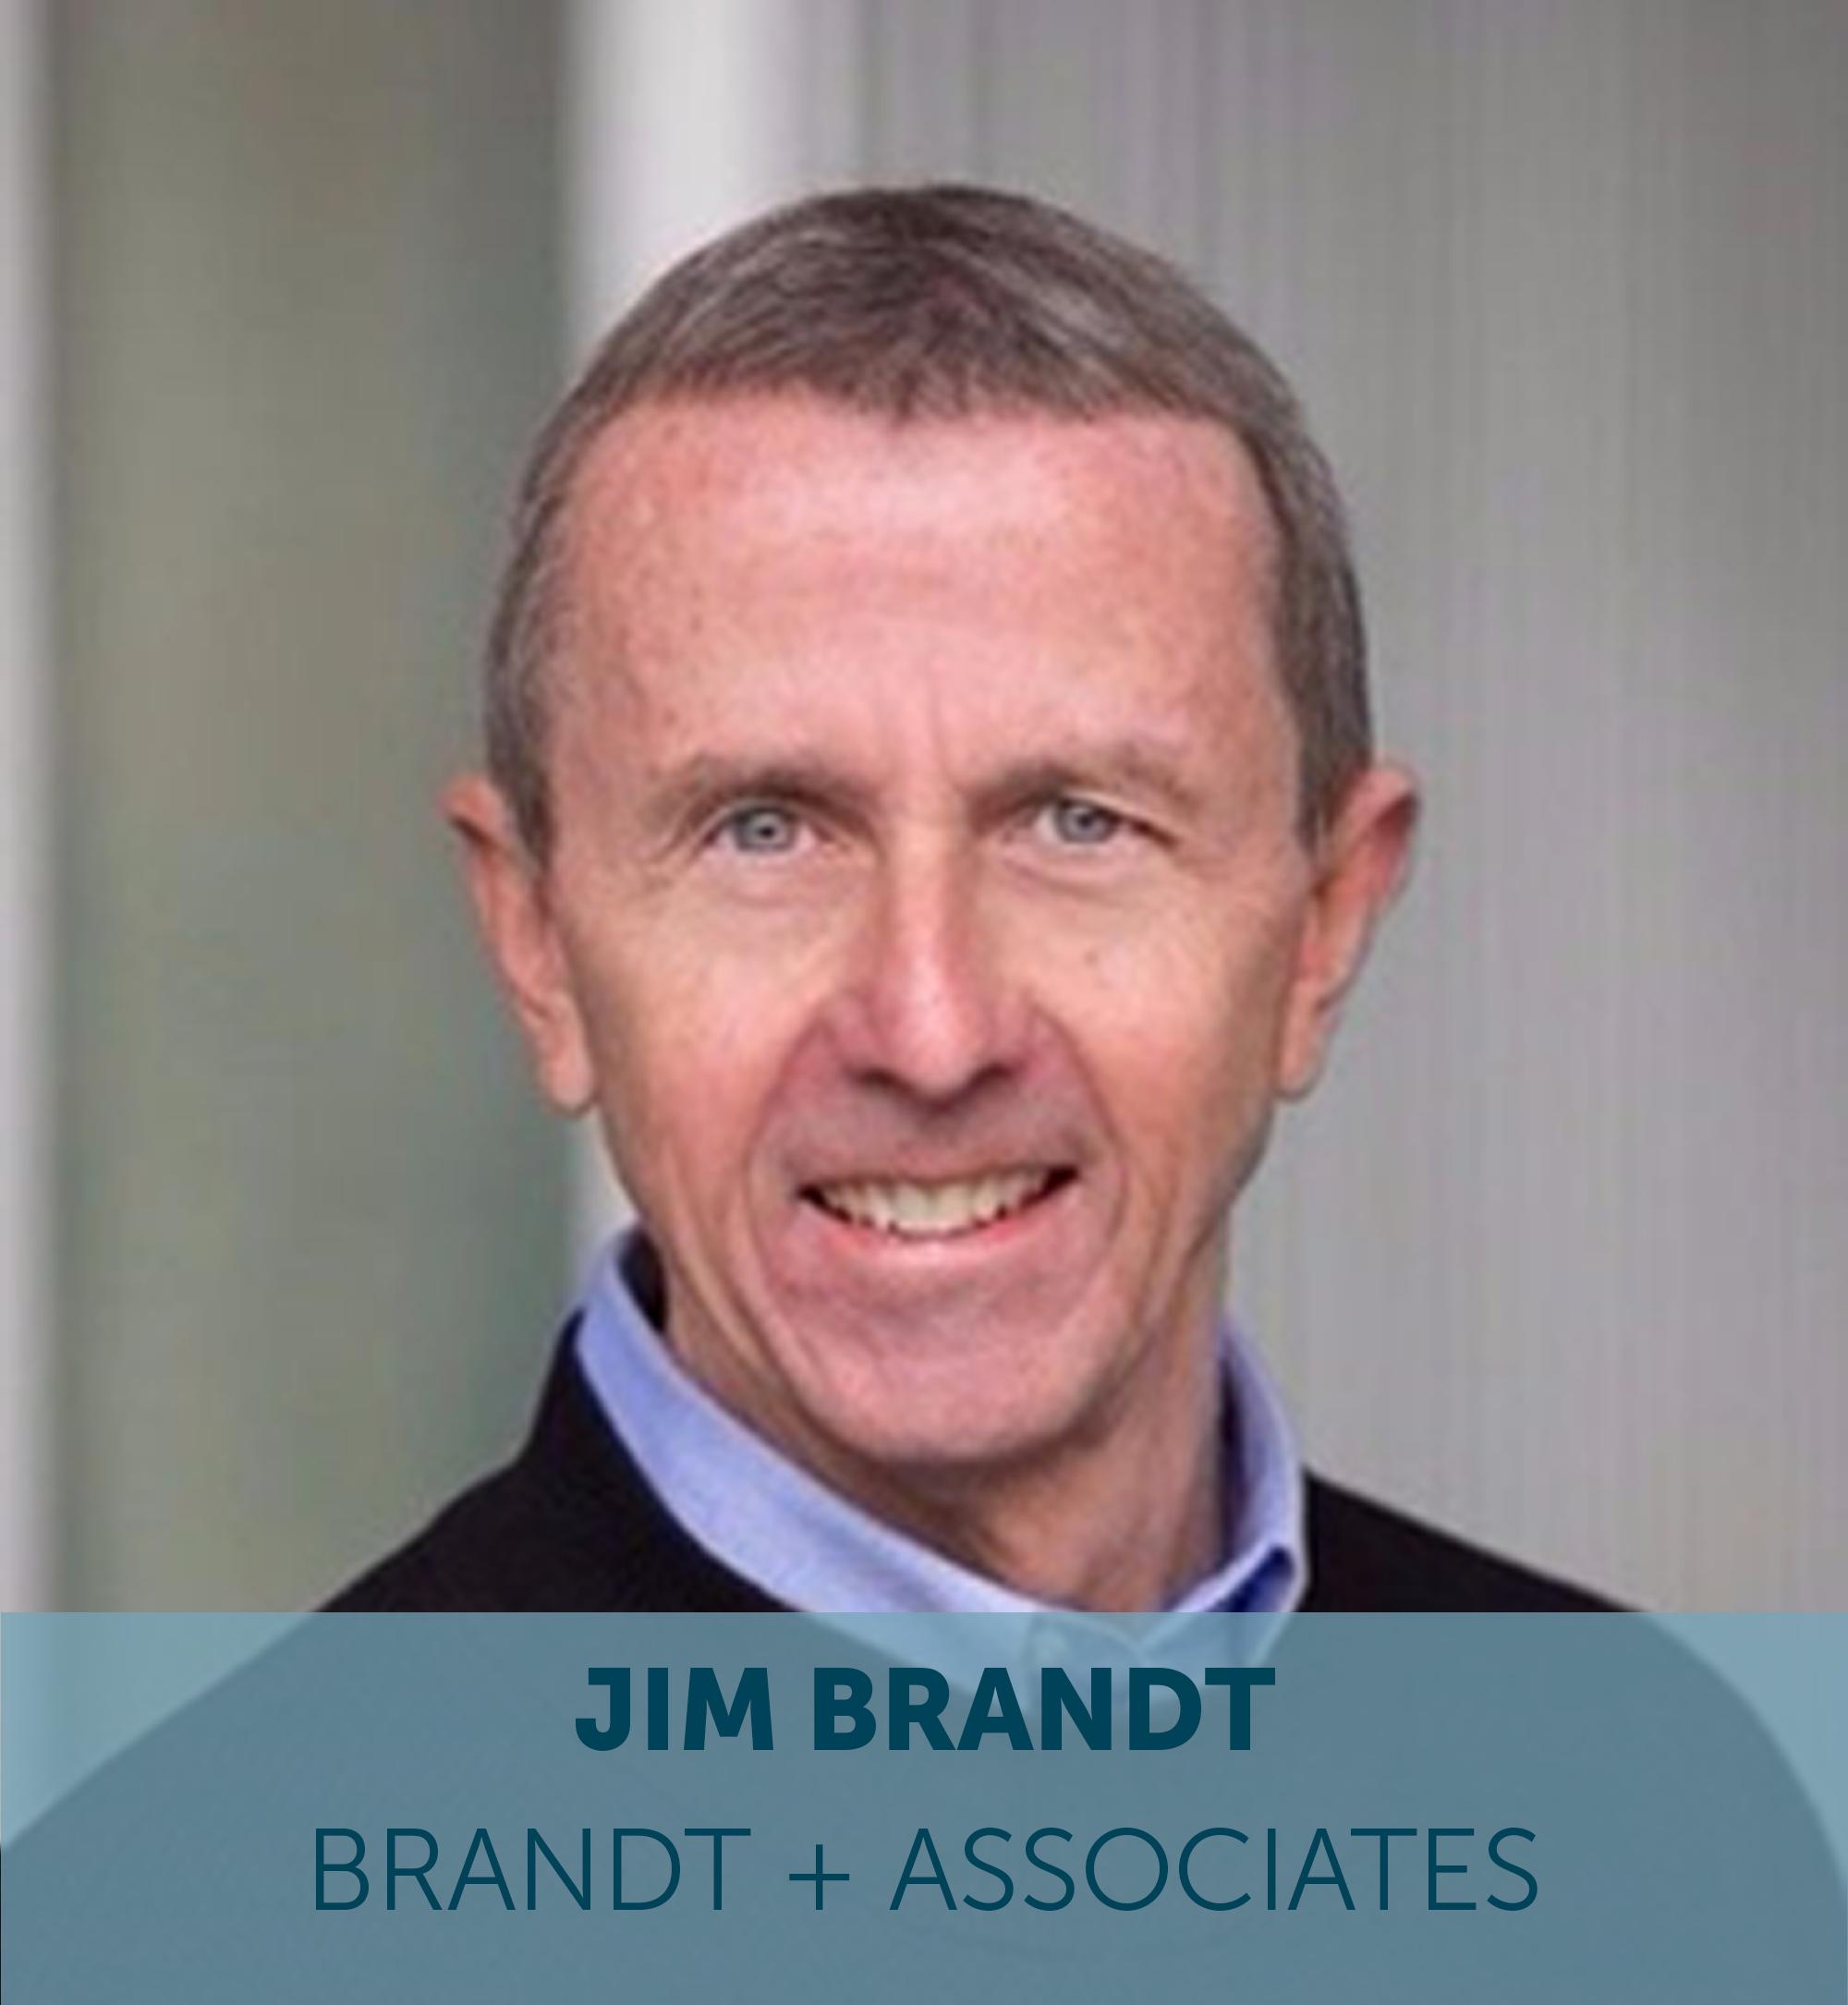 Brandt, Jim(title).png